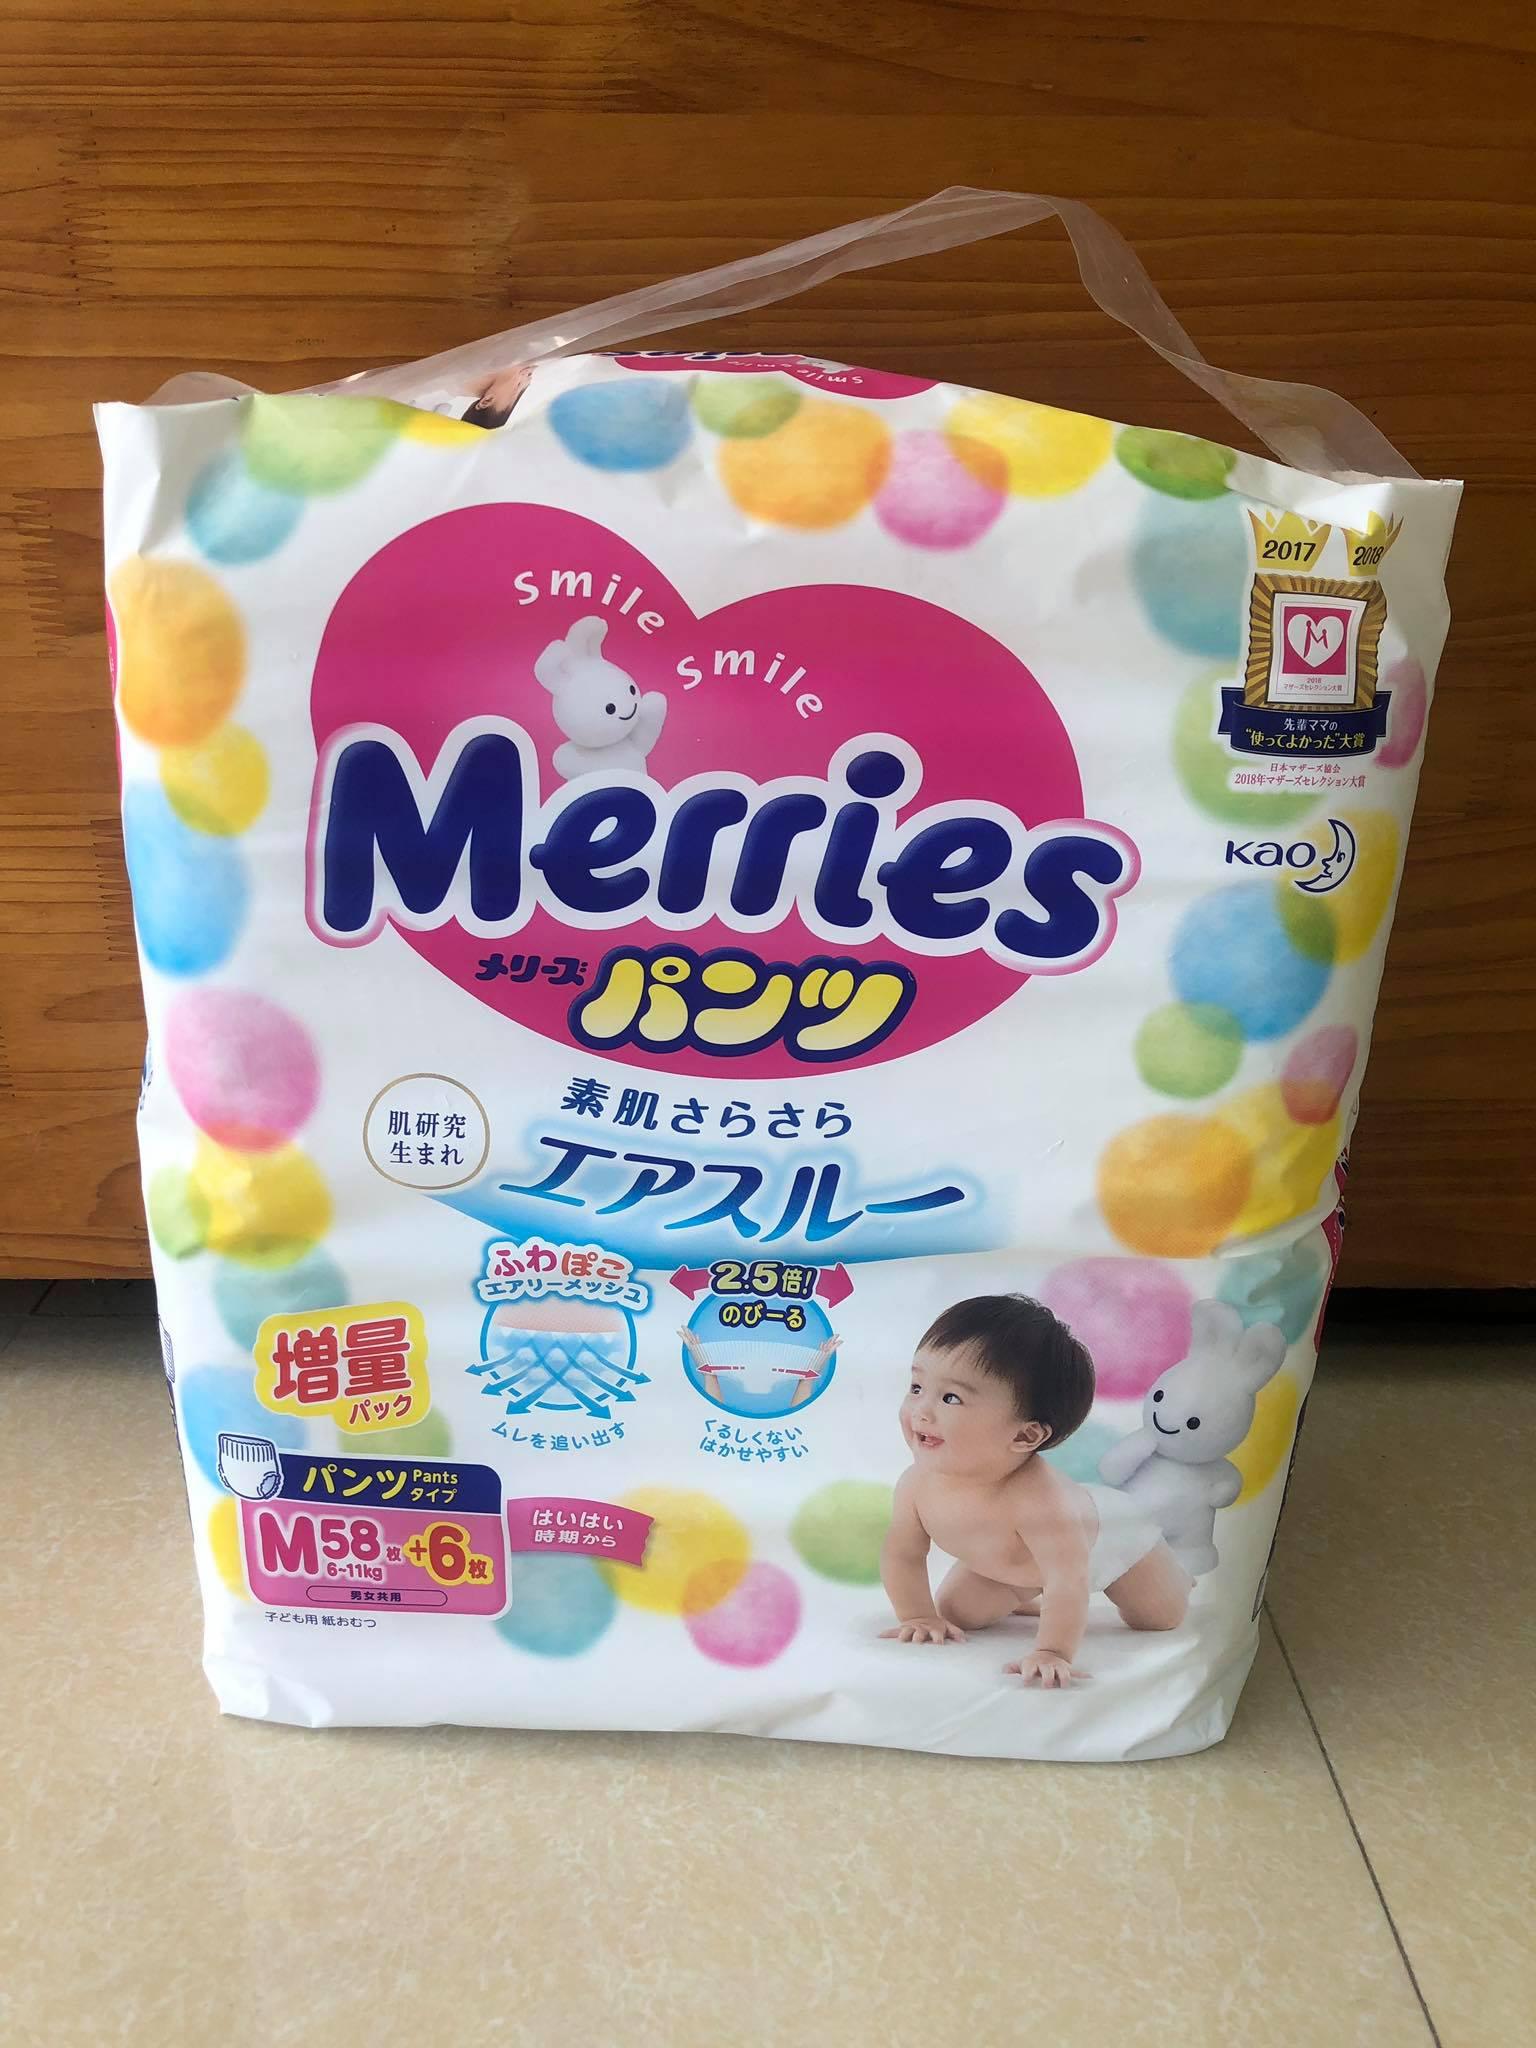 BỈM QUẦN MERRIES M58+6